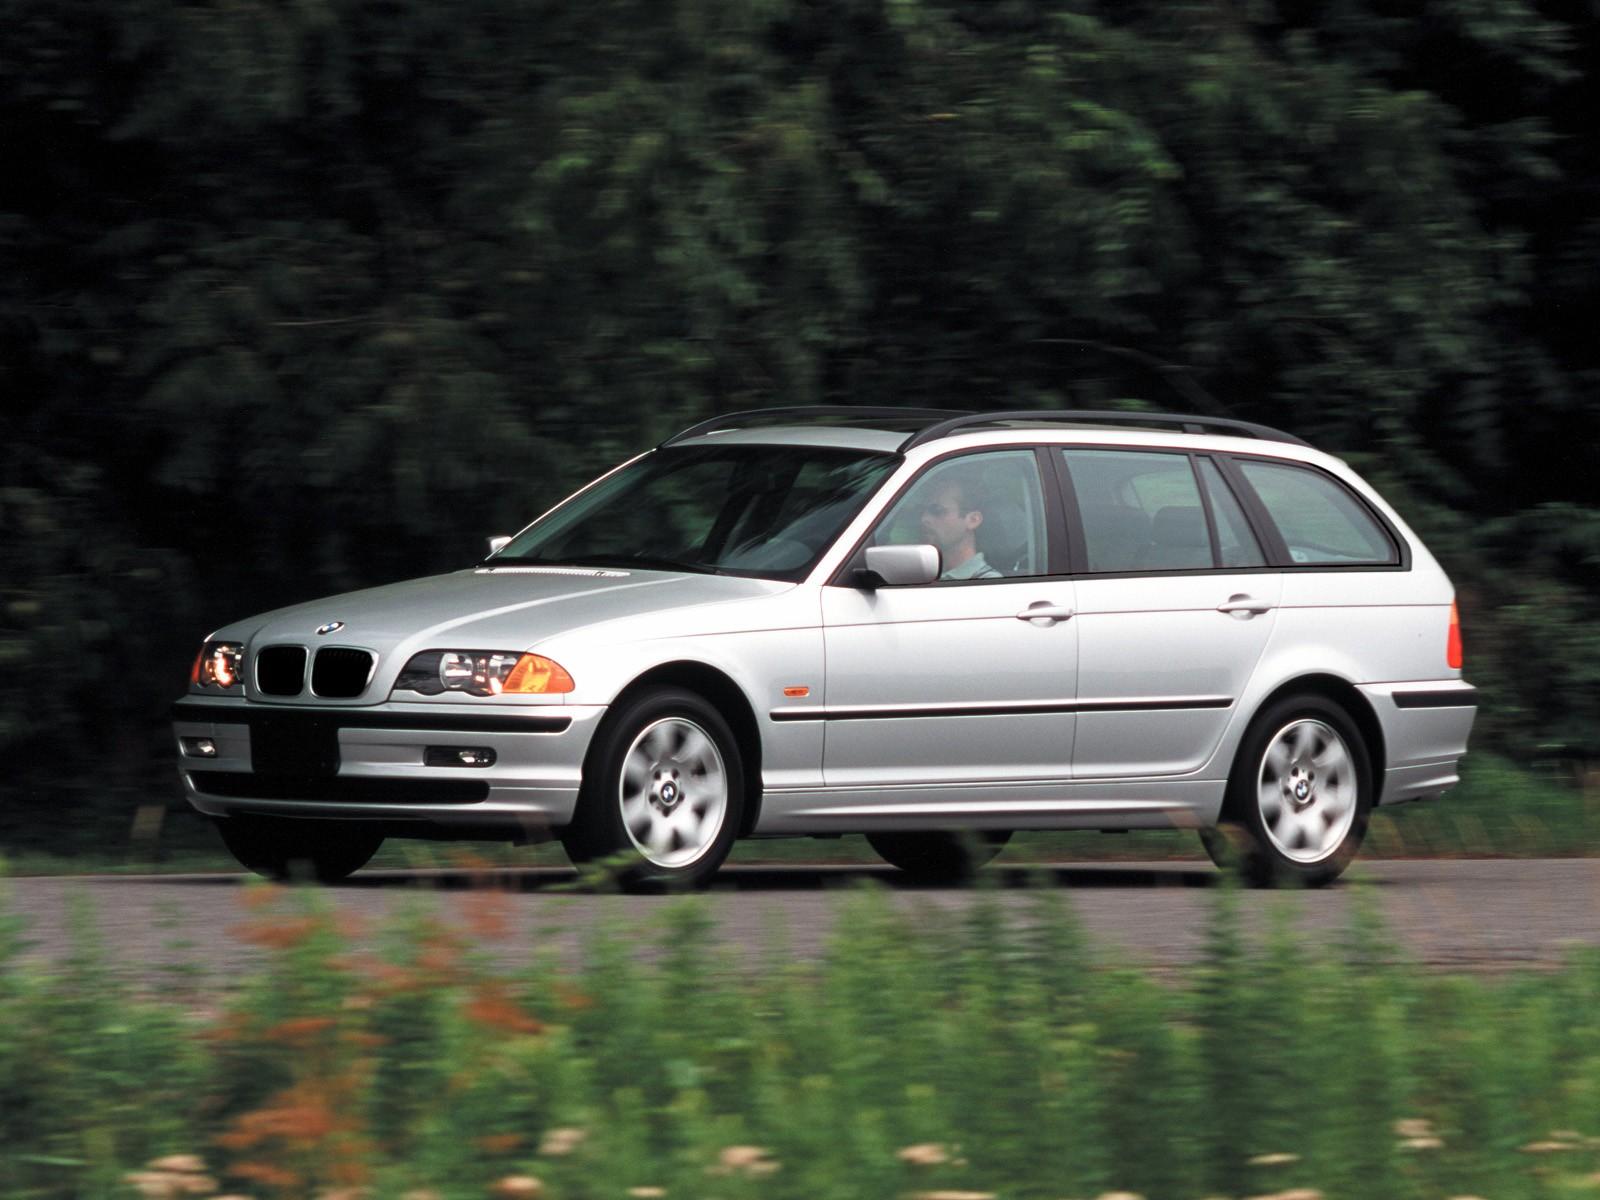 BMW Series Touring E Specs Autoevolution - 2002 bmw 328i specs